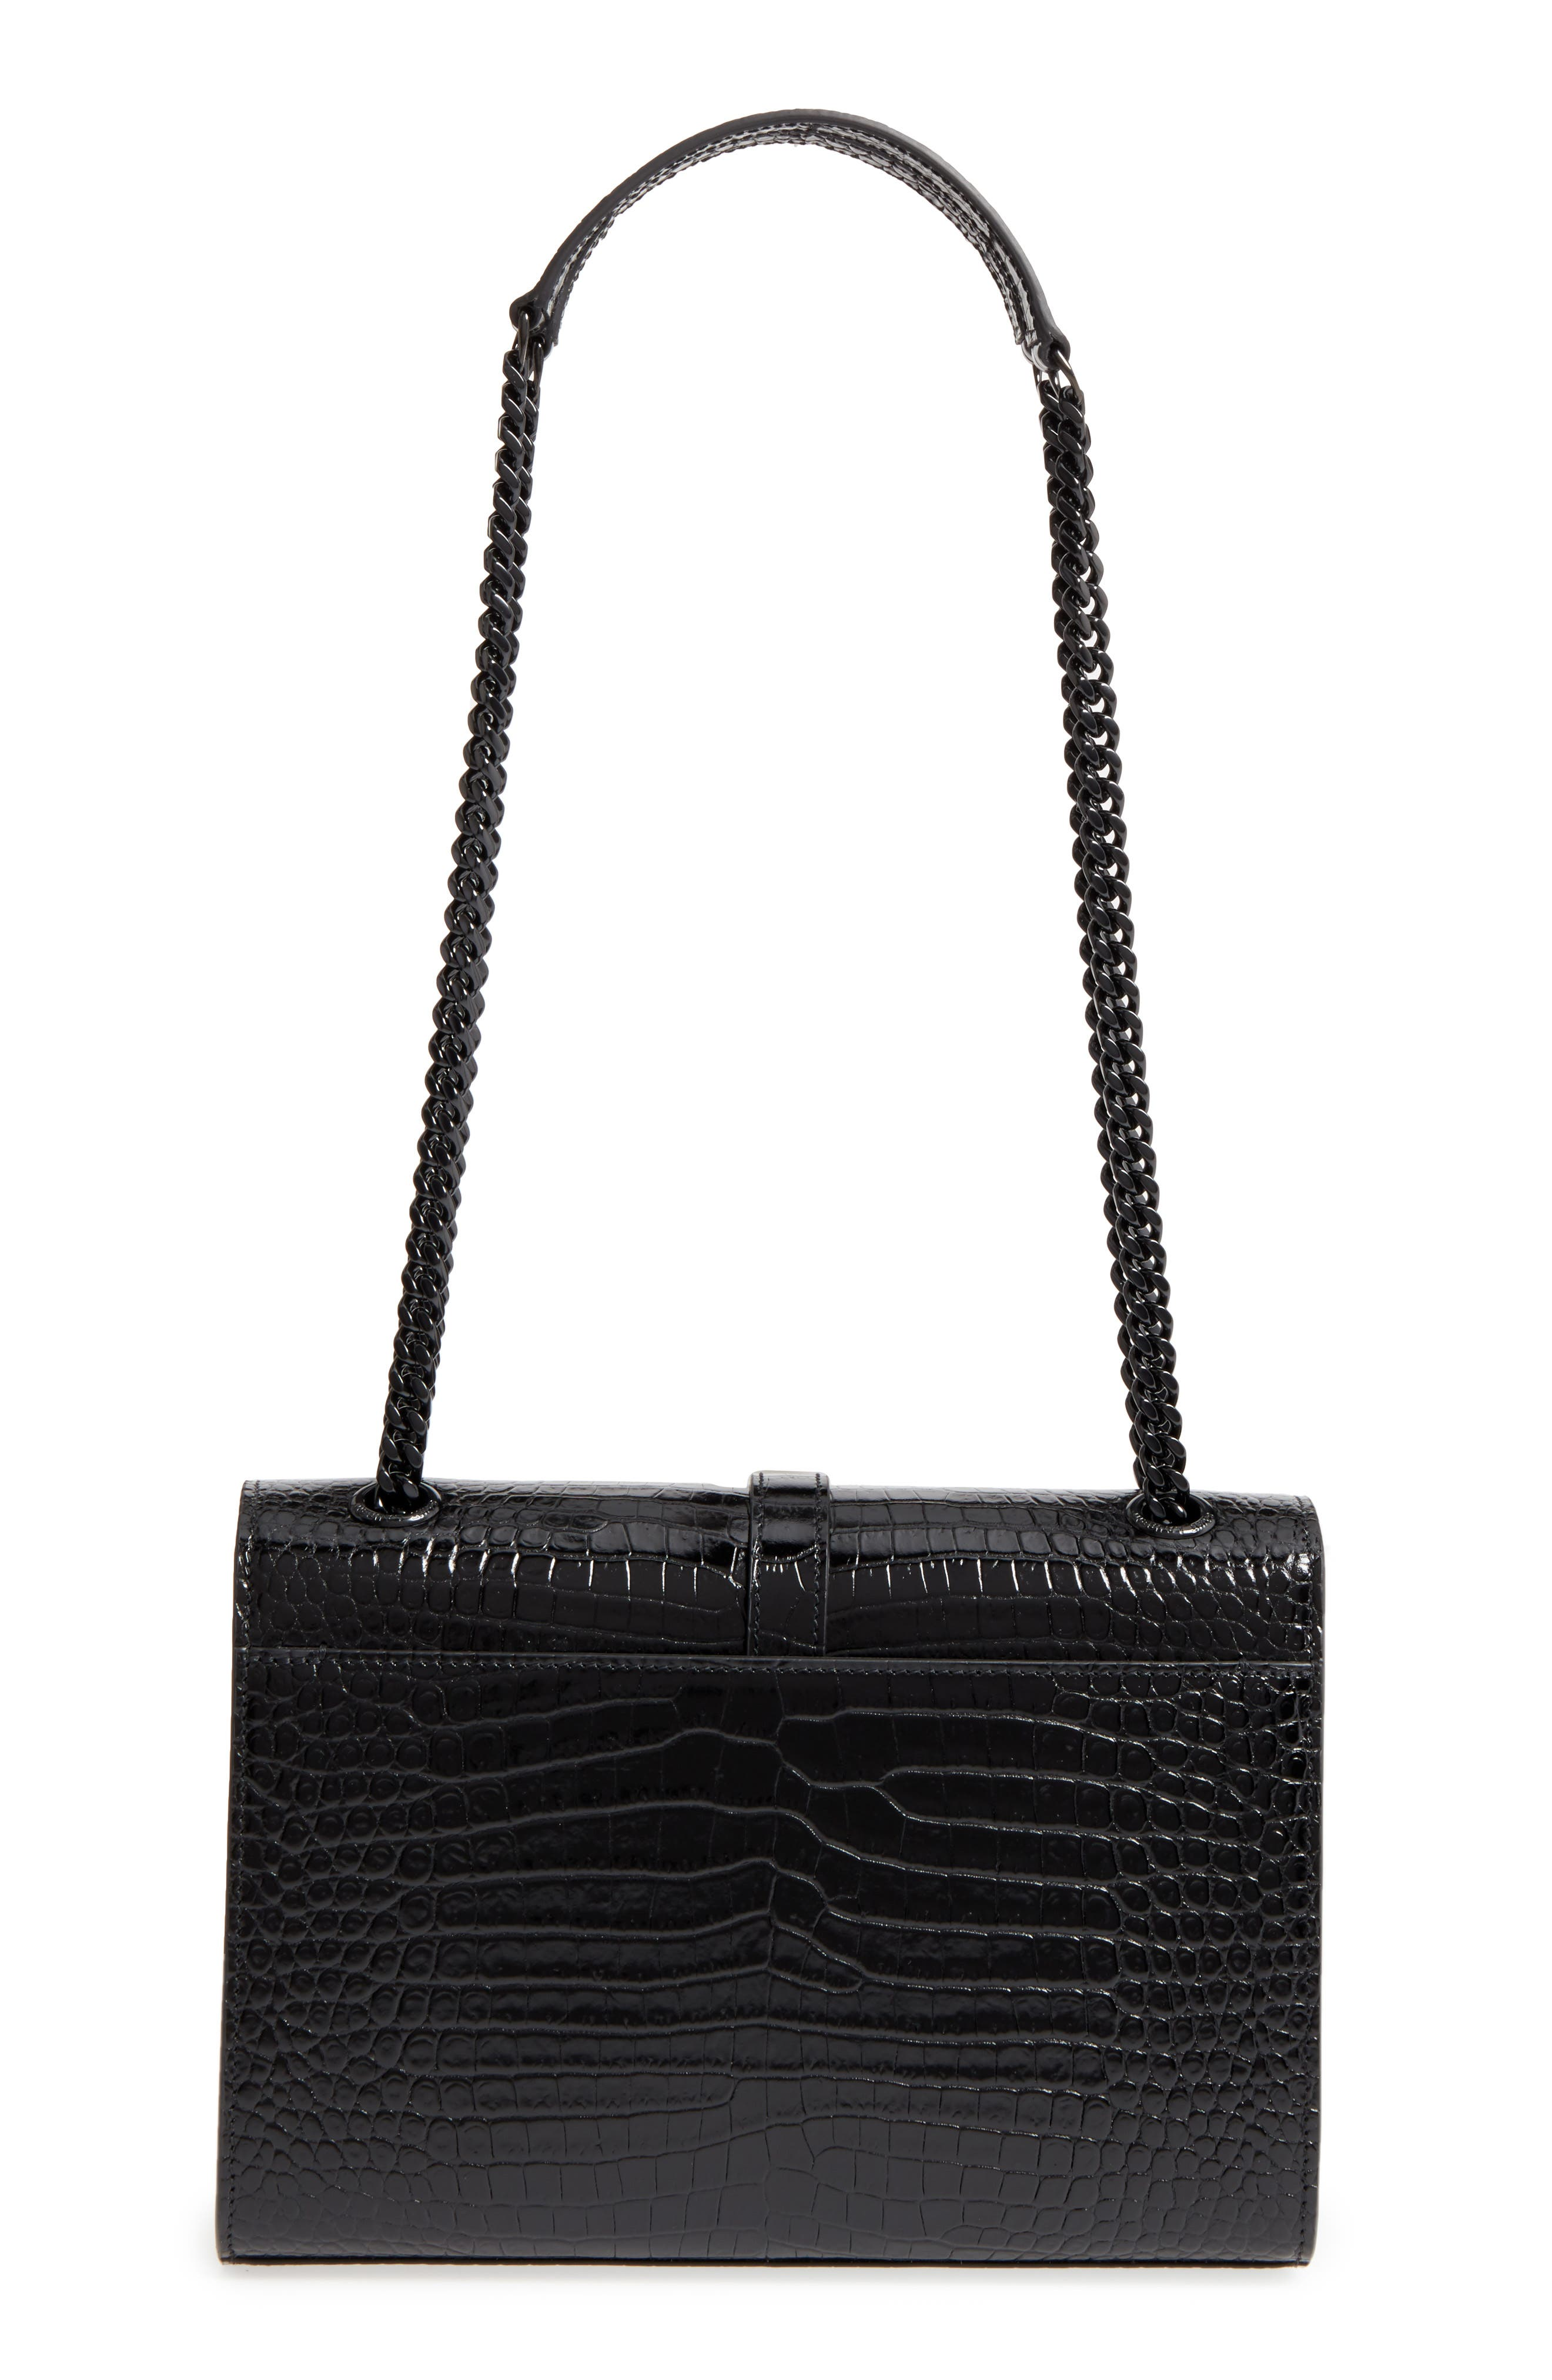 Medium Croc-Embossed Calfskin Shoulder Bag,                             Alternate thumbnail 3, color,                             001